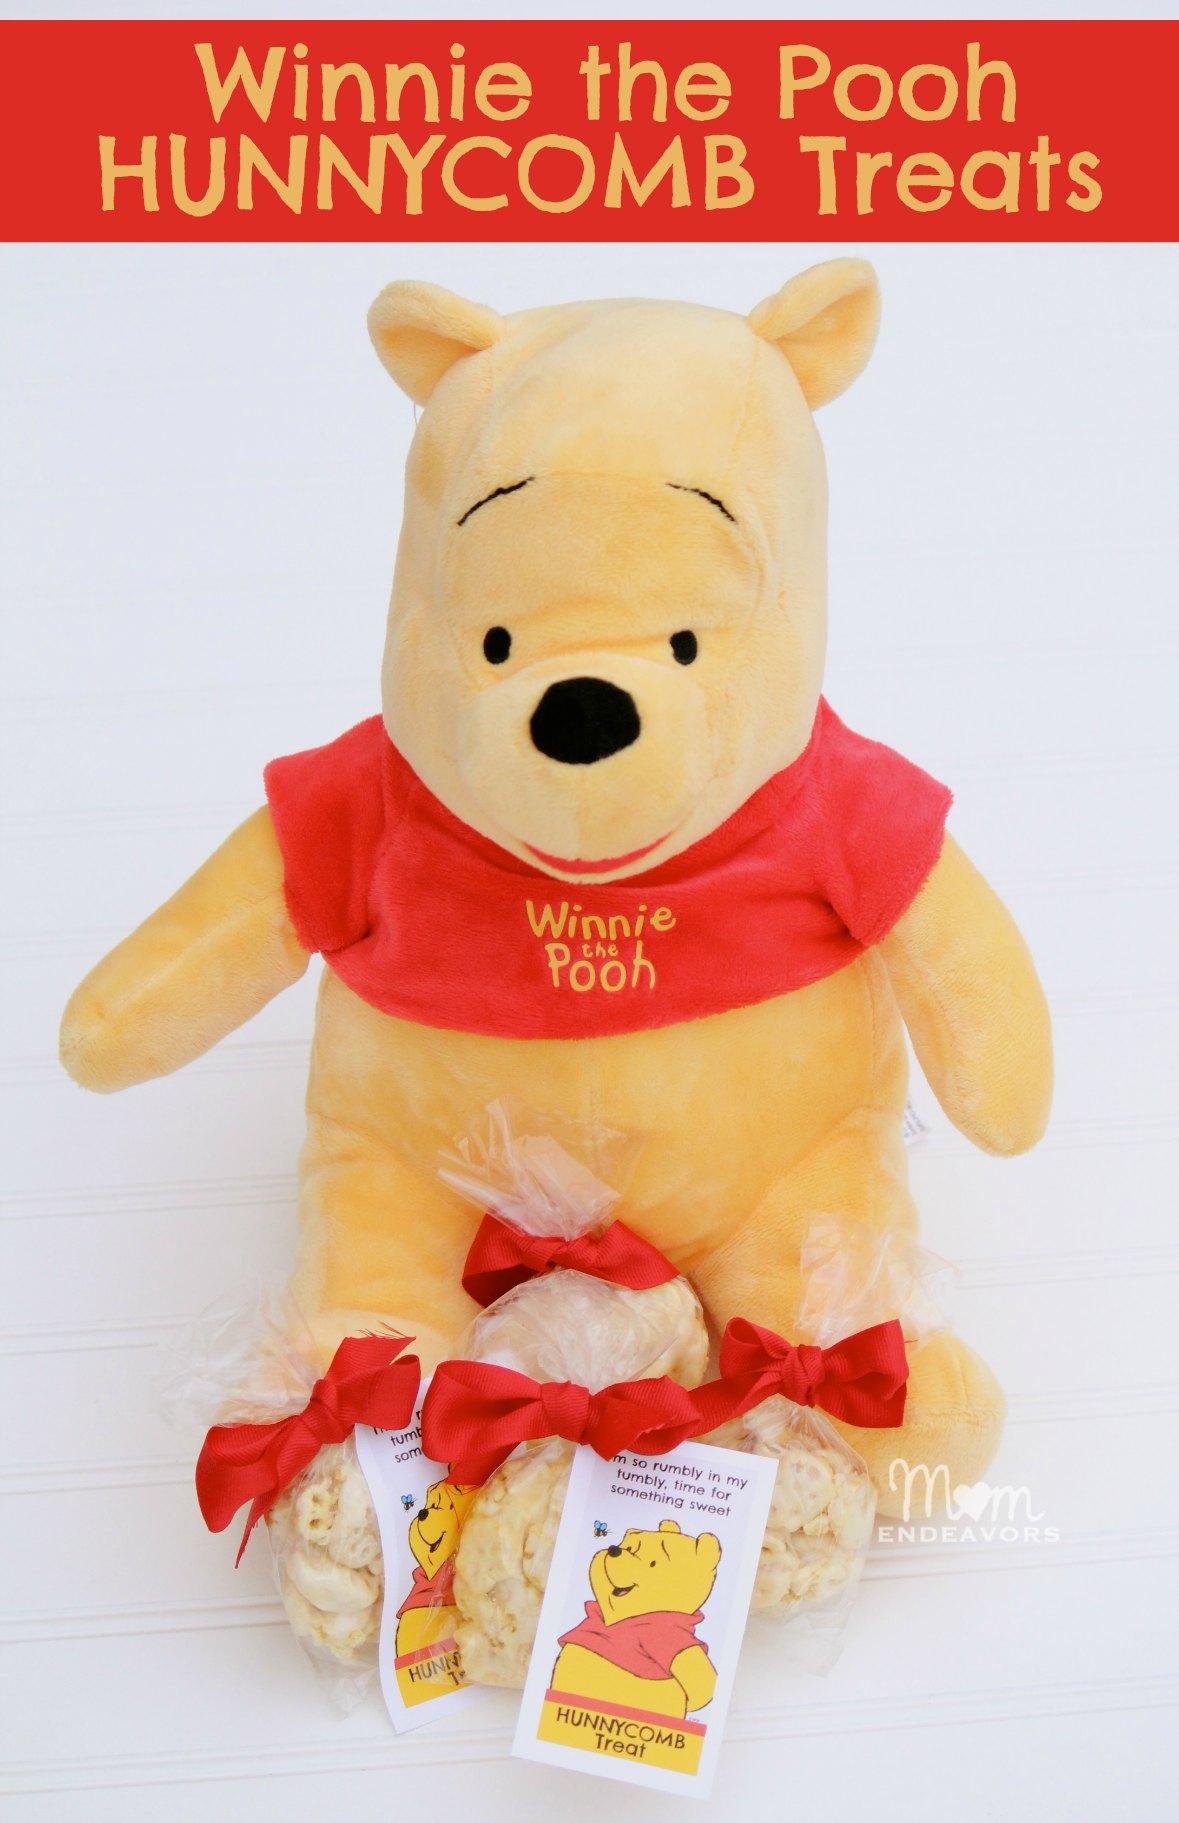 Winnie the Pooh Hunnycomb Treats